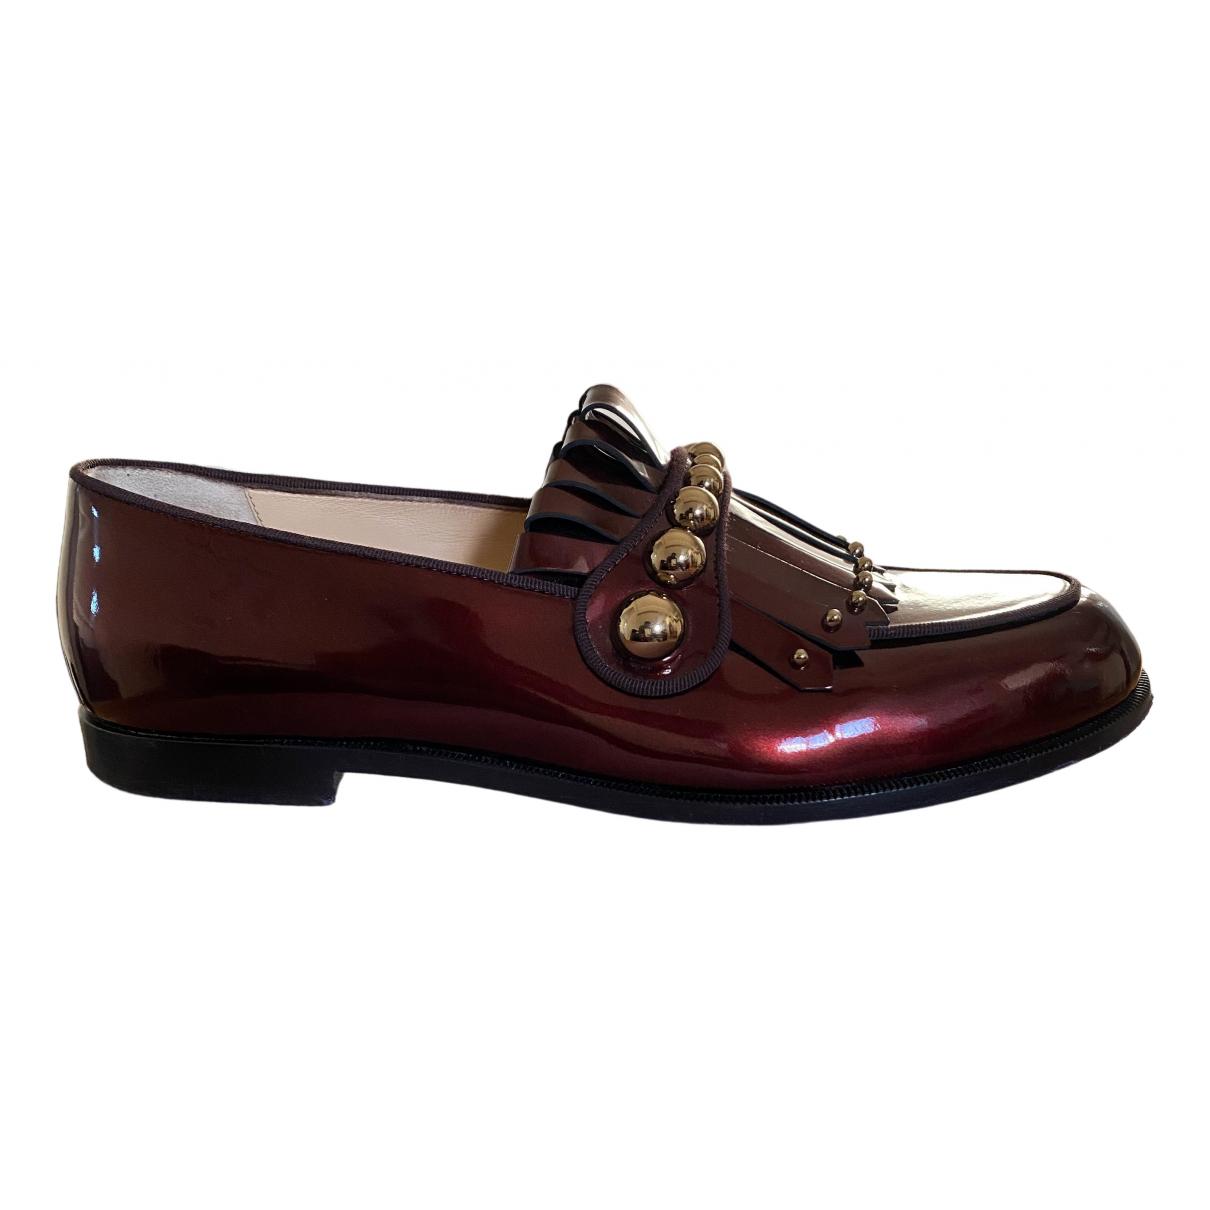 Christian Louboutin \N Burgundy Patent leather Flats for Men 40.5 EU